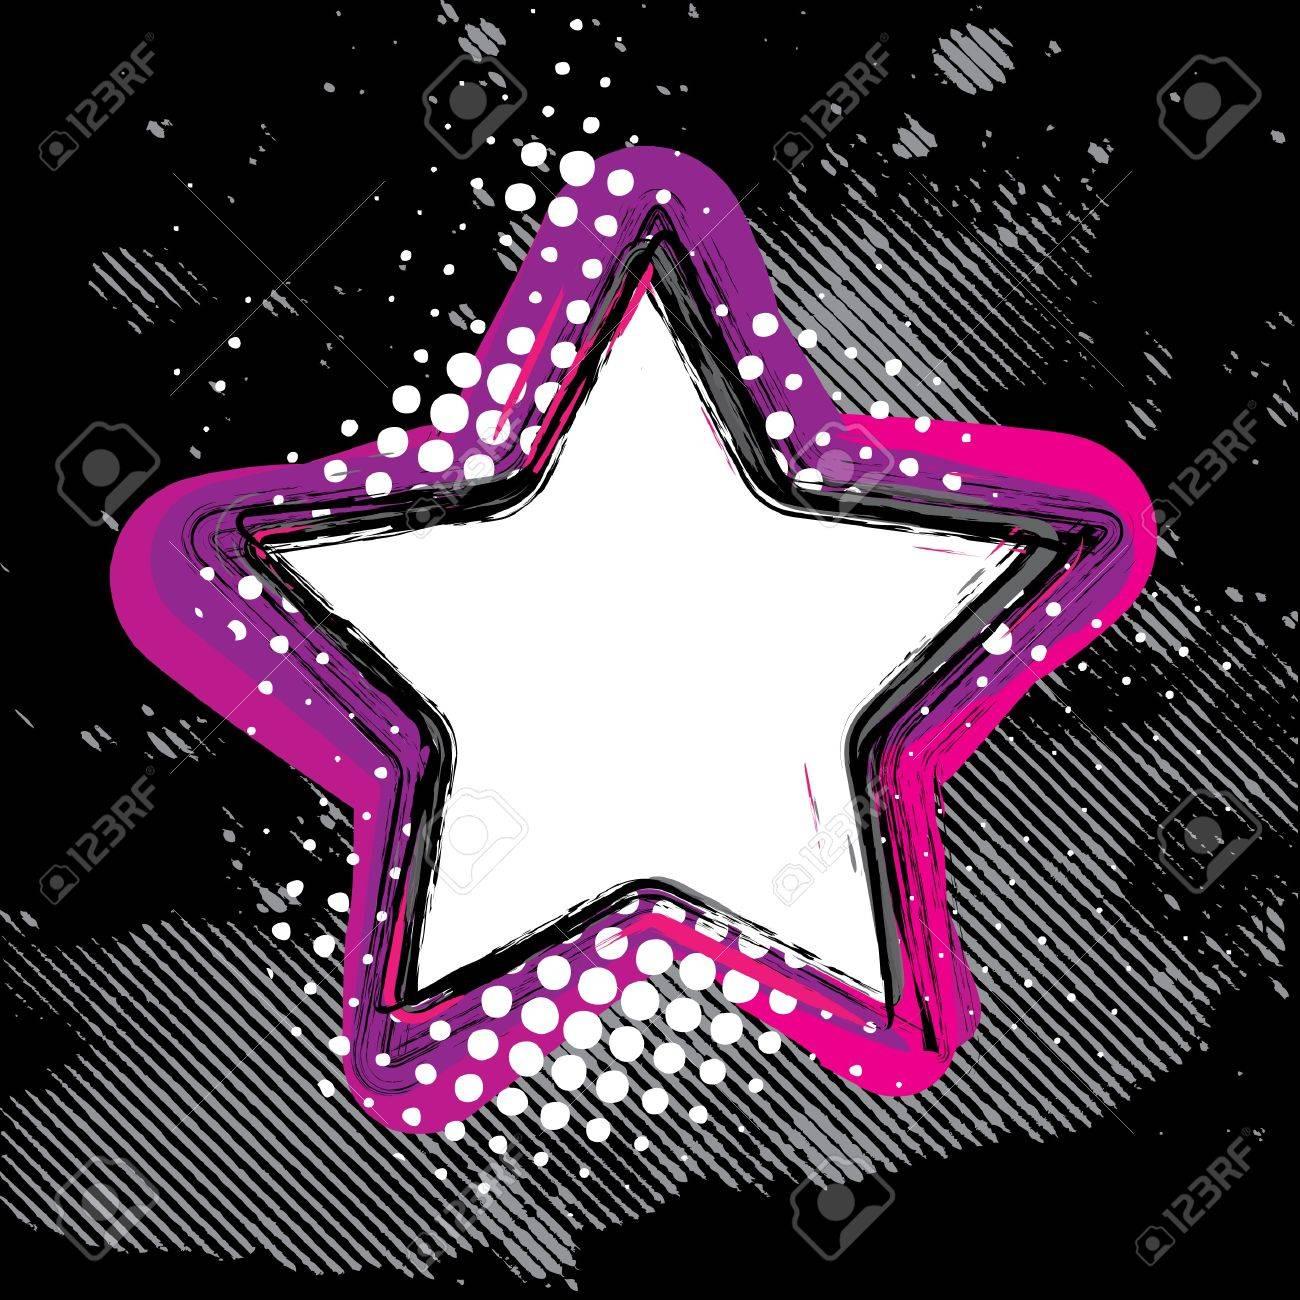 Grunge Star Stock Vector - 14557358